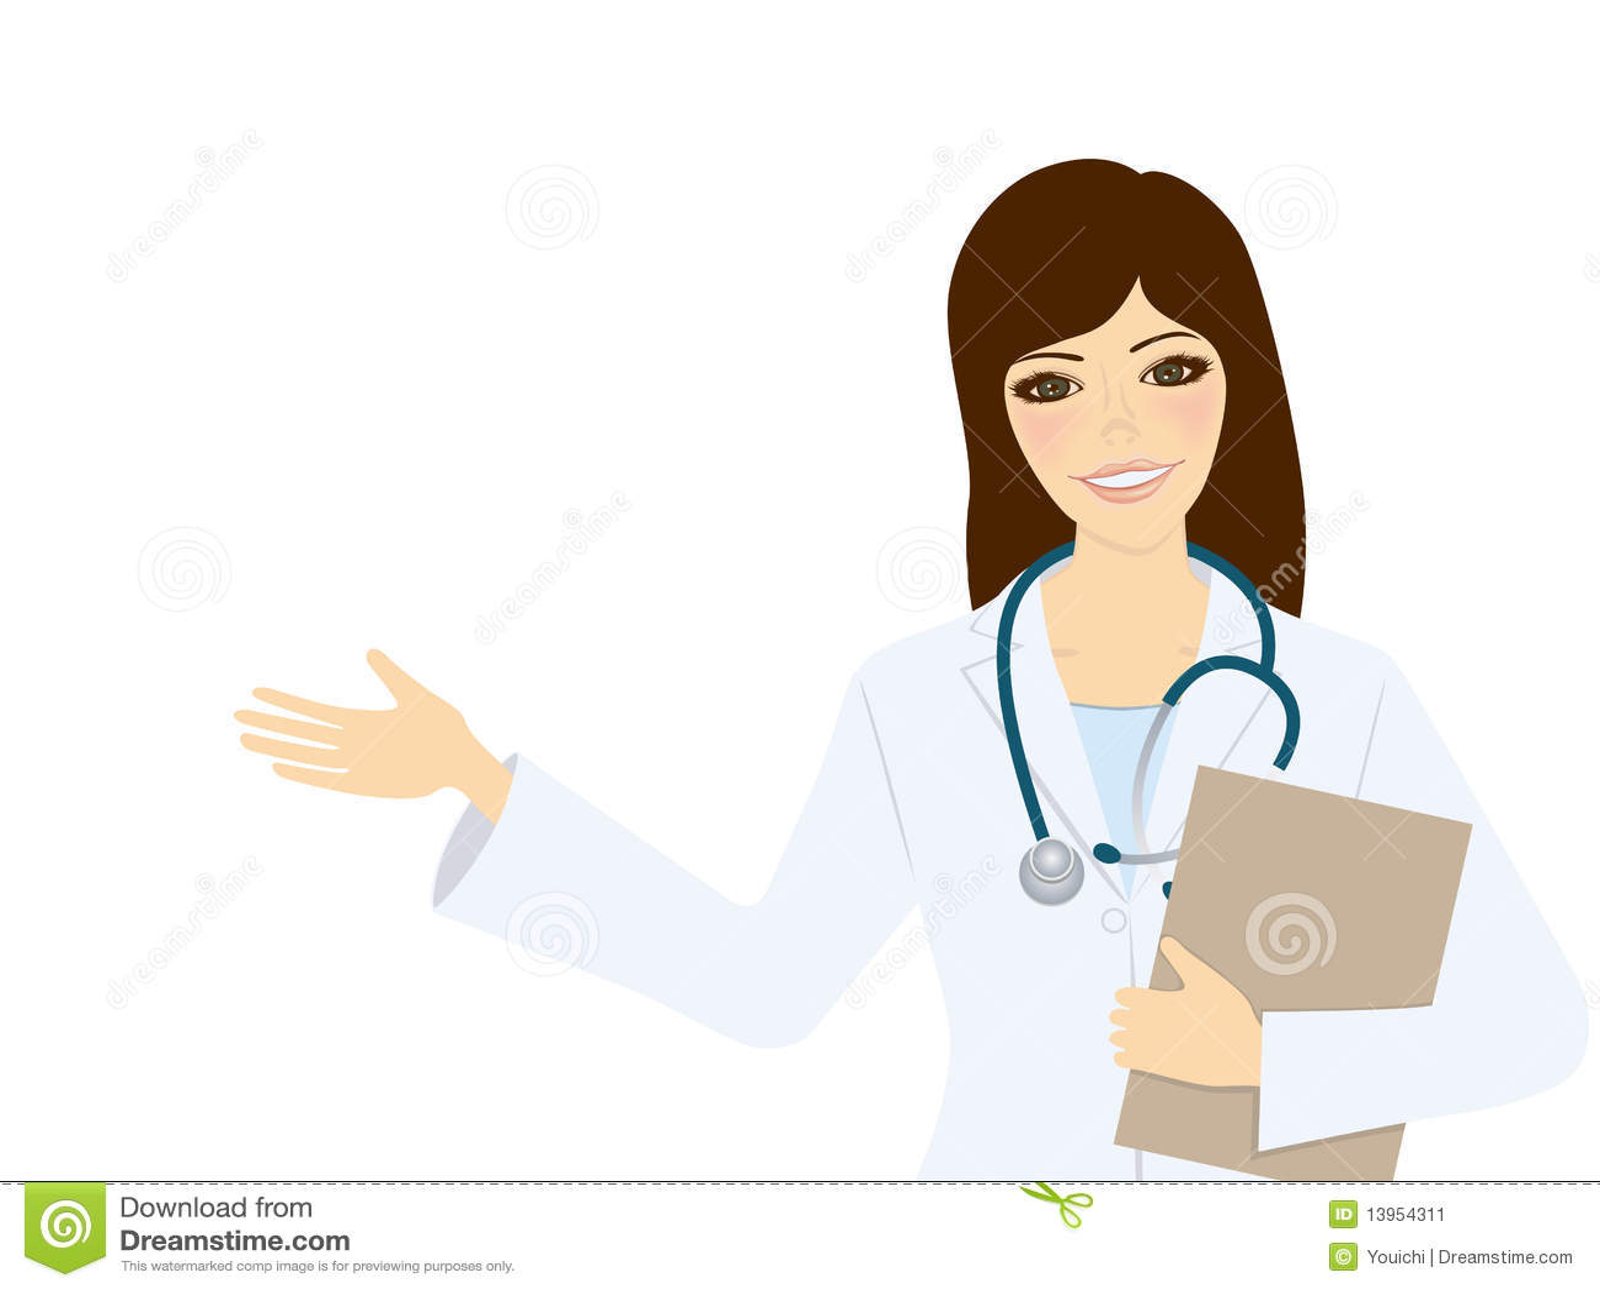 pediatrician job information